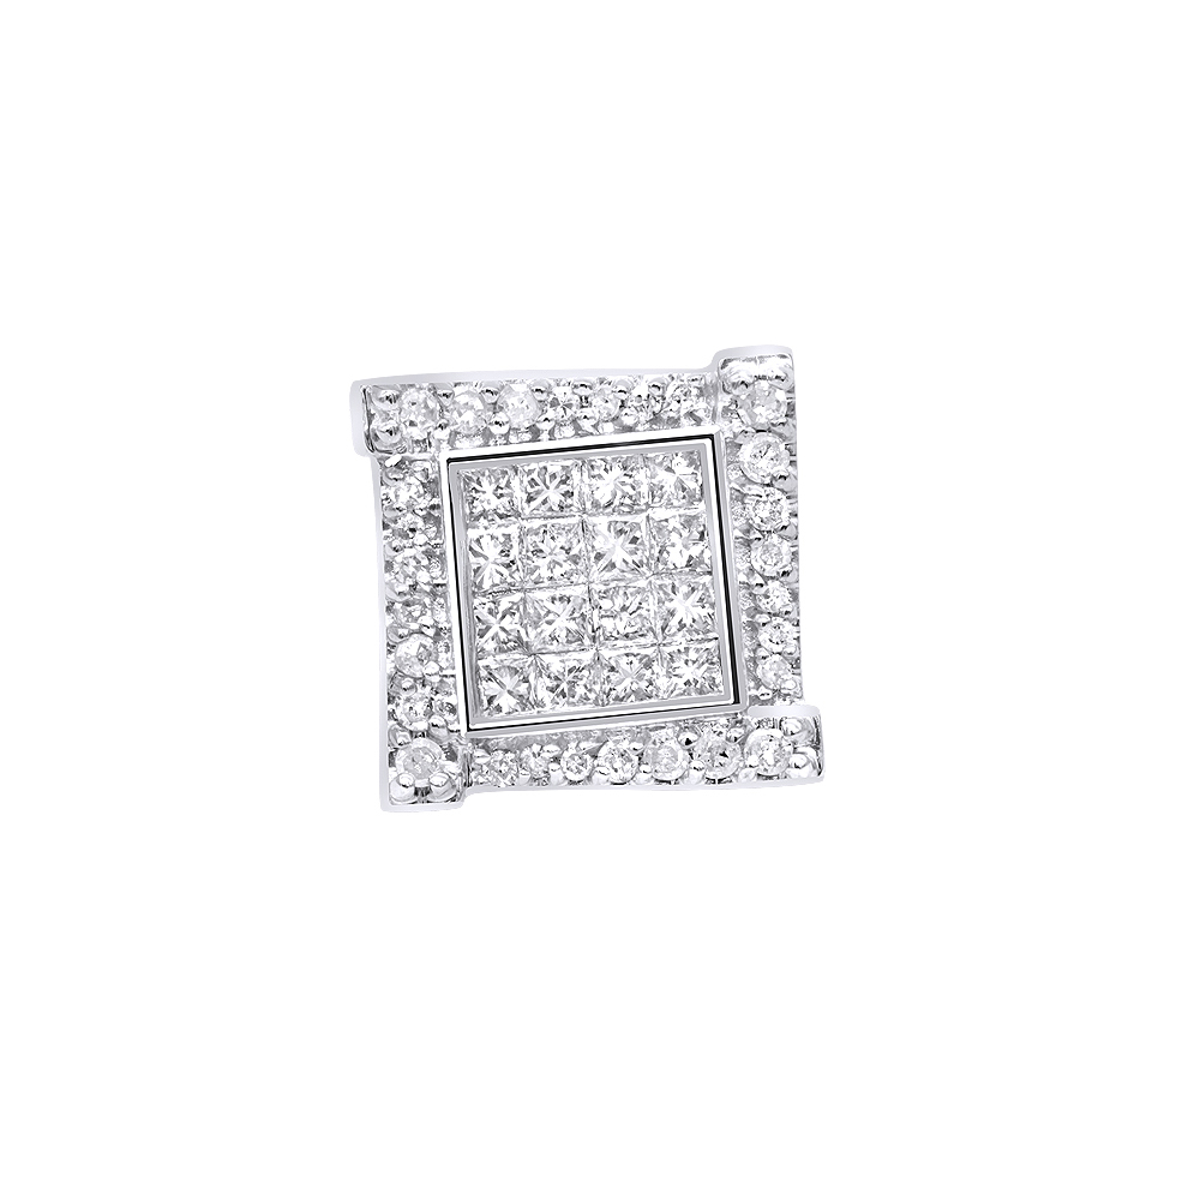 14k Gold Diamond Earring for Men Single Stud Princess Round Diamonds 0.5ct